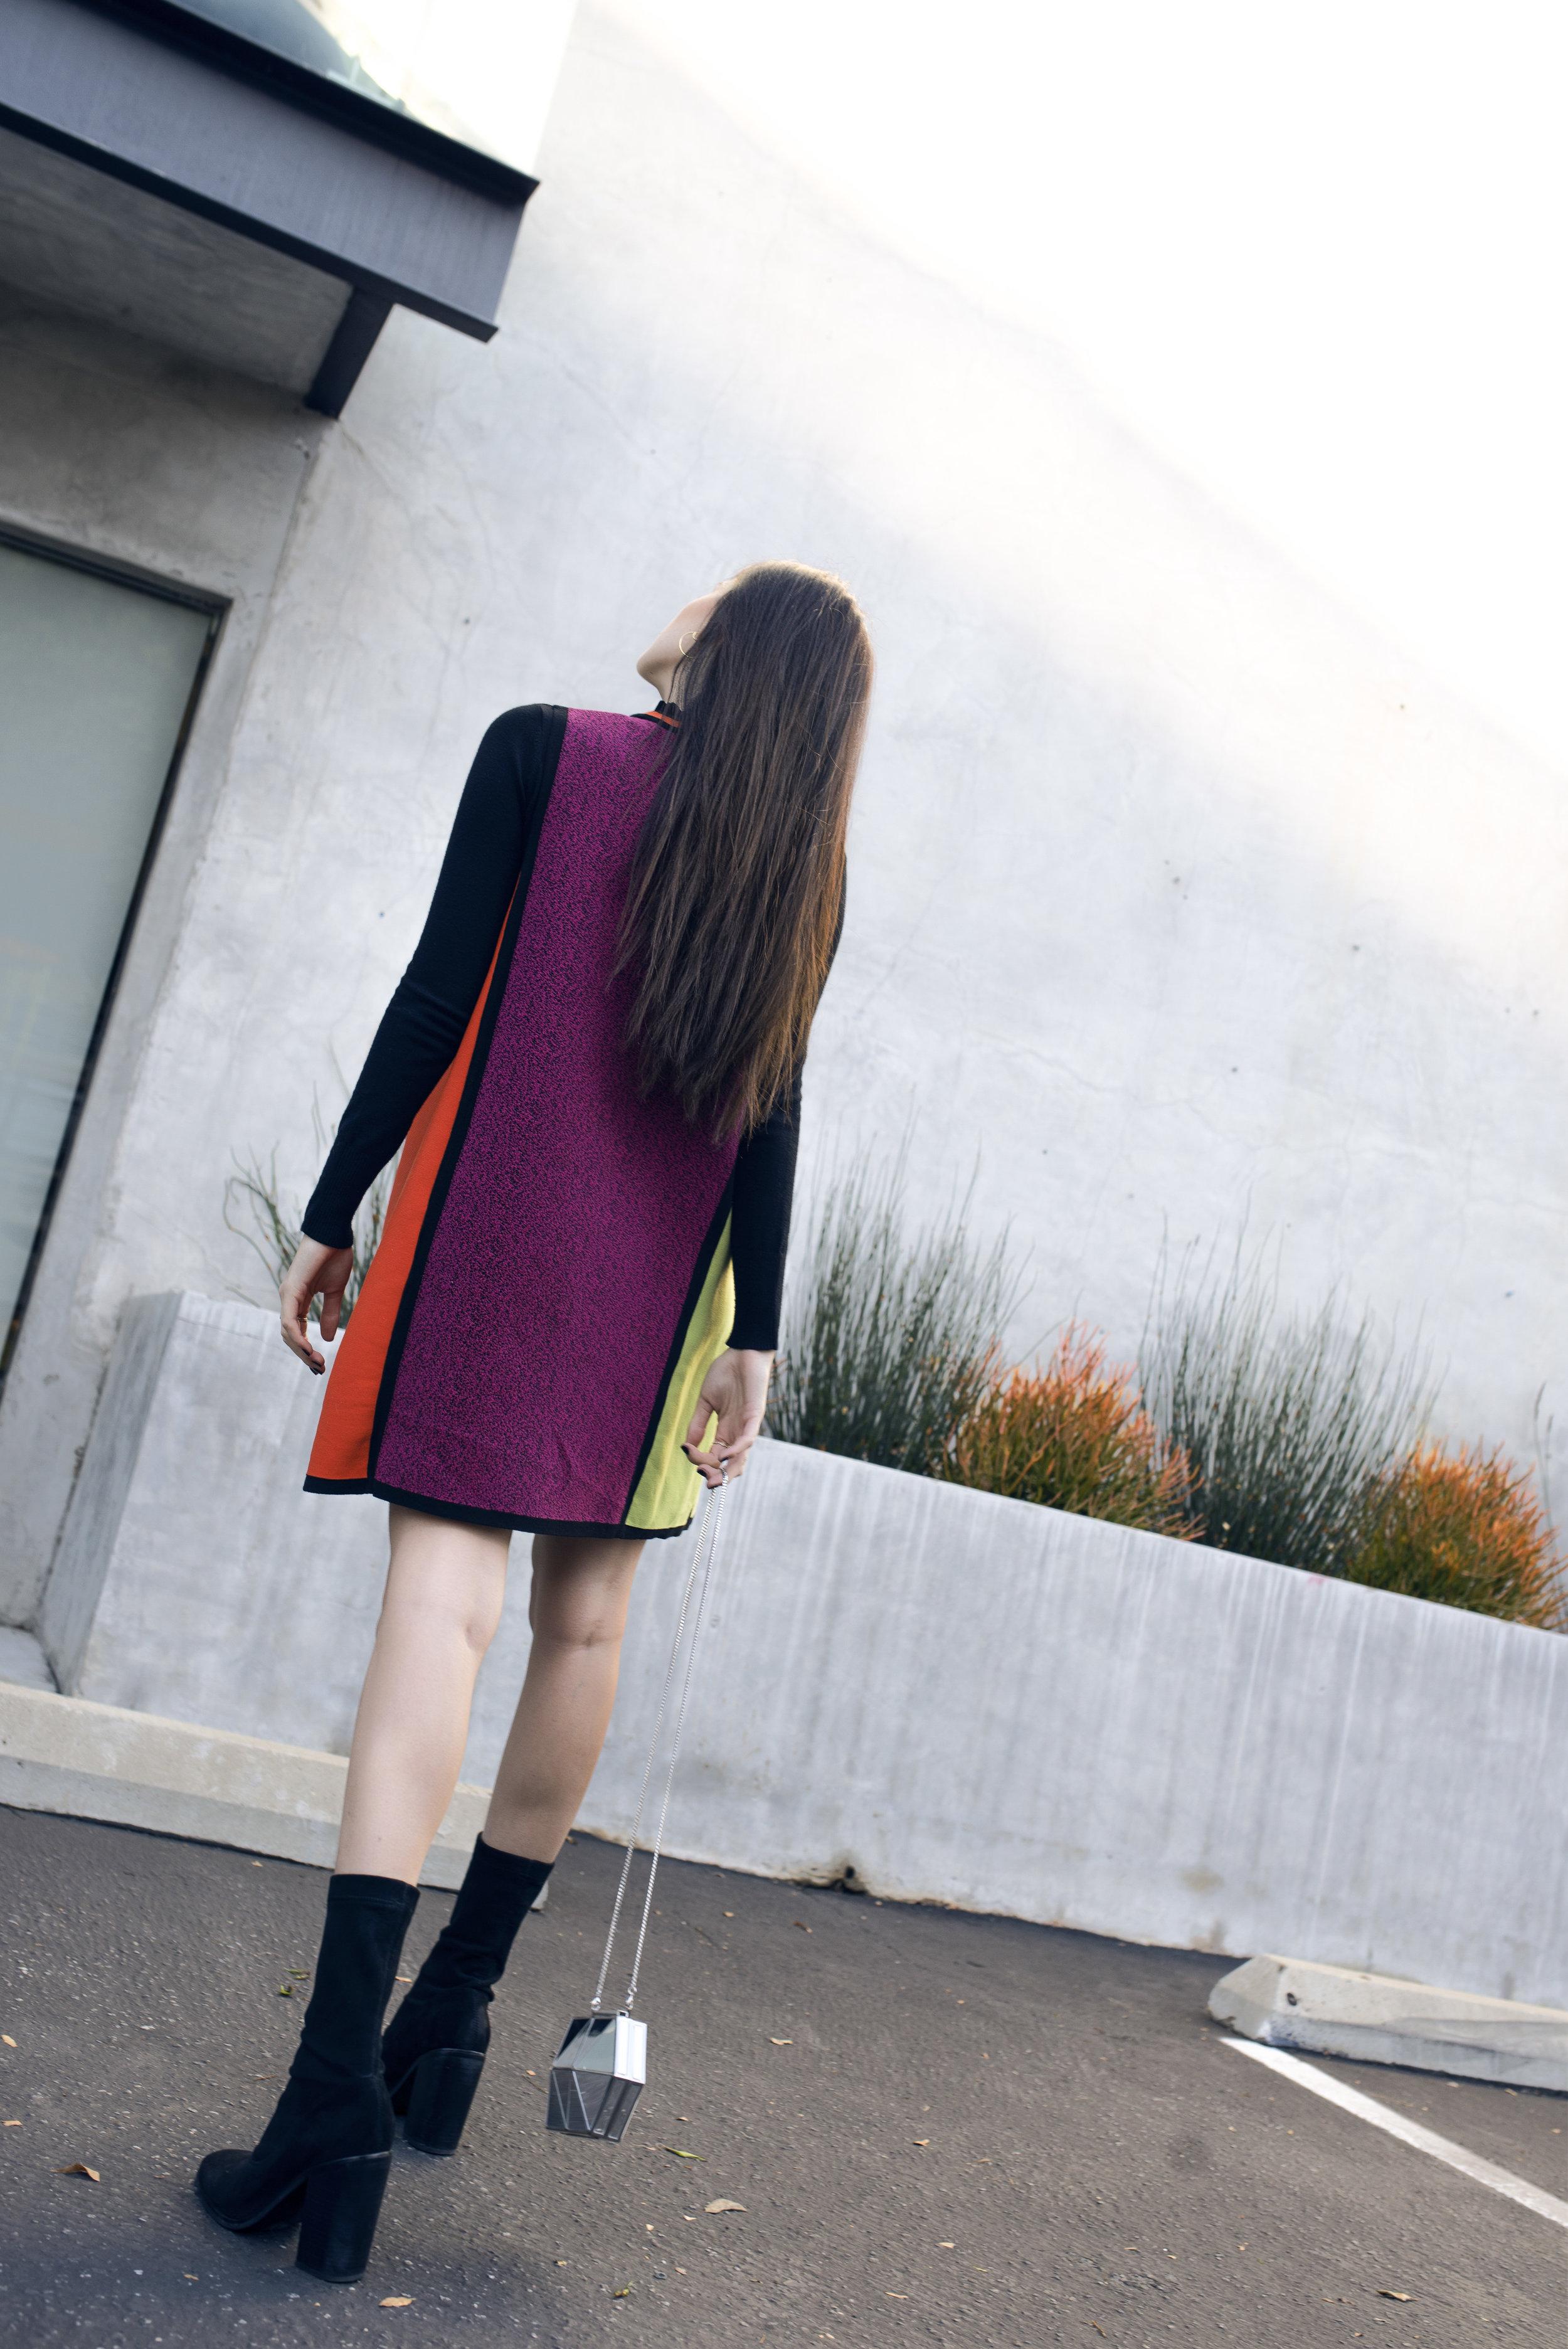 Cibelle-x-JuliaF-_-Missoni_2_05.jpg